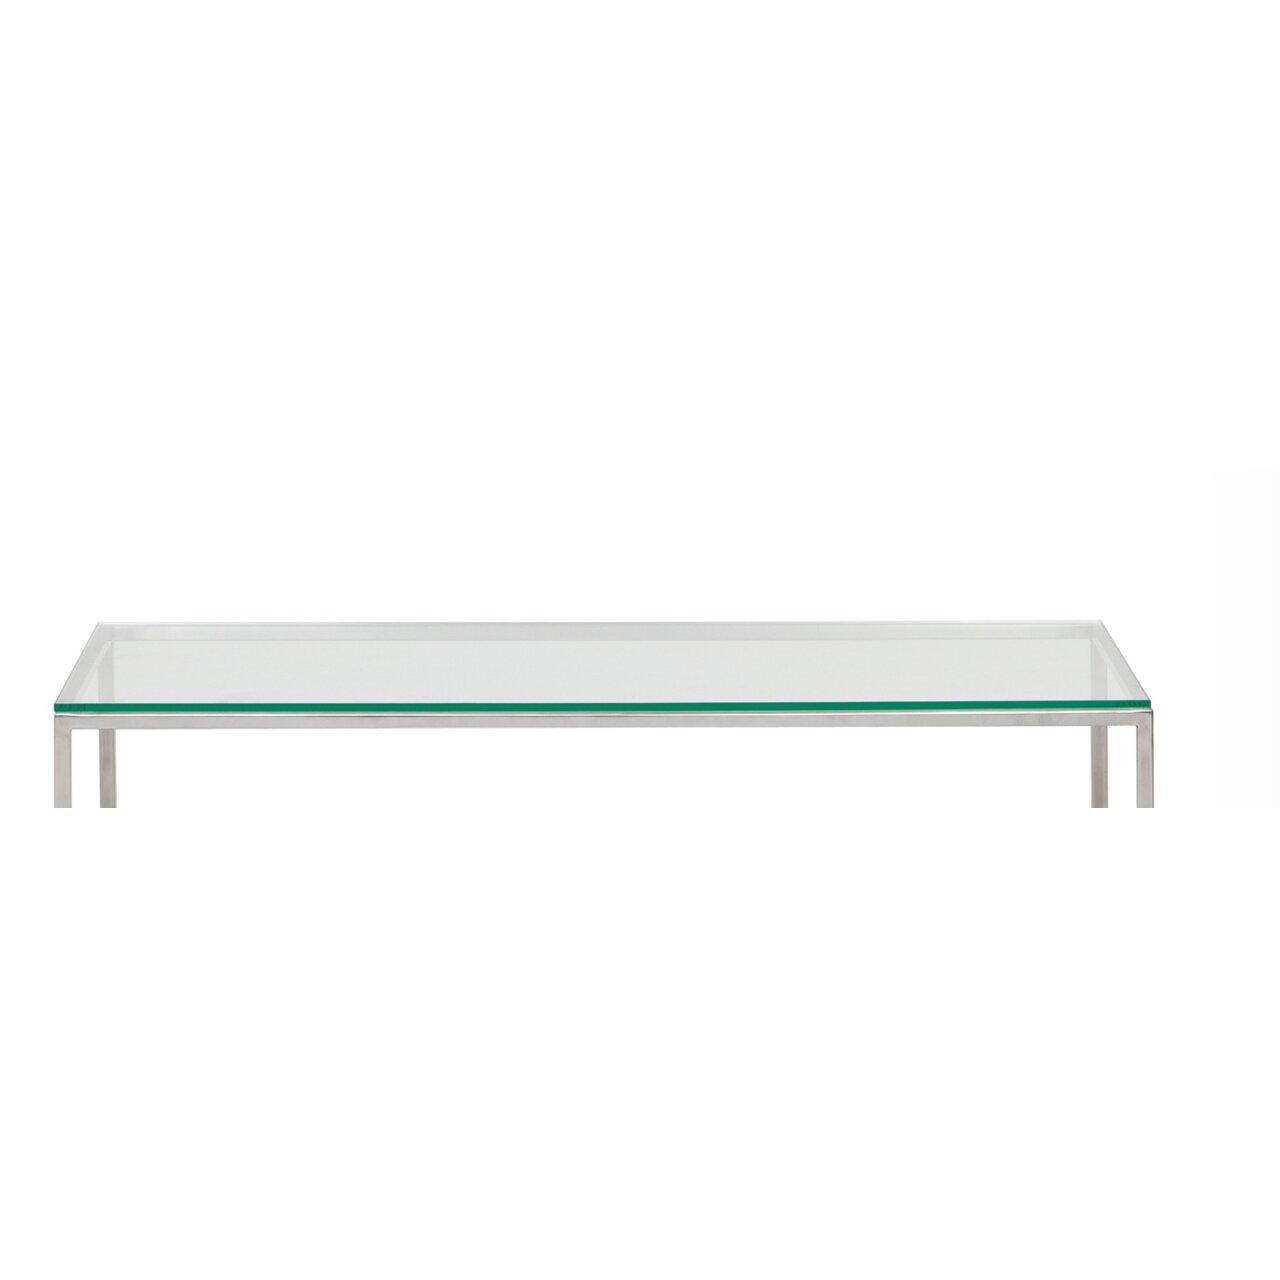 Living Accent Tables Coffee Tables EQ3 SKU EQEQ1282